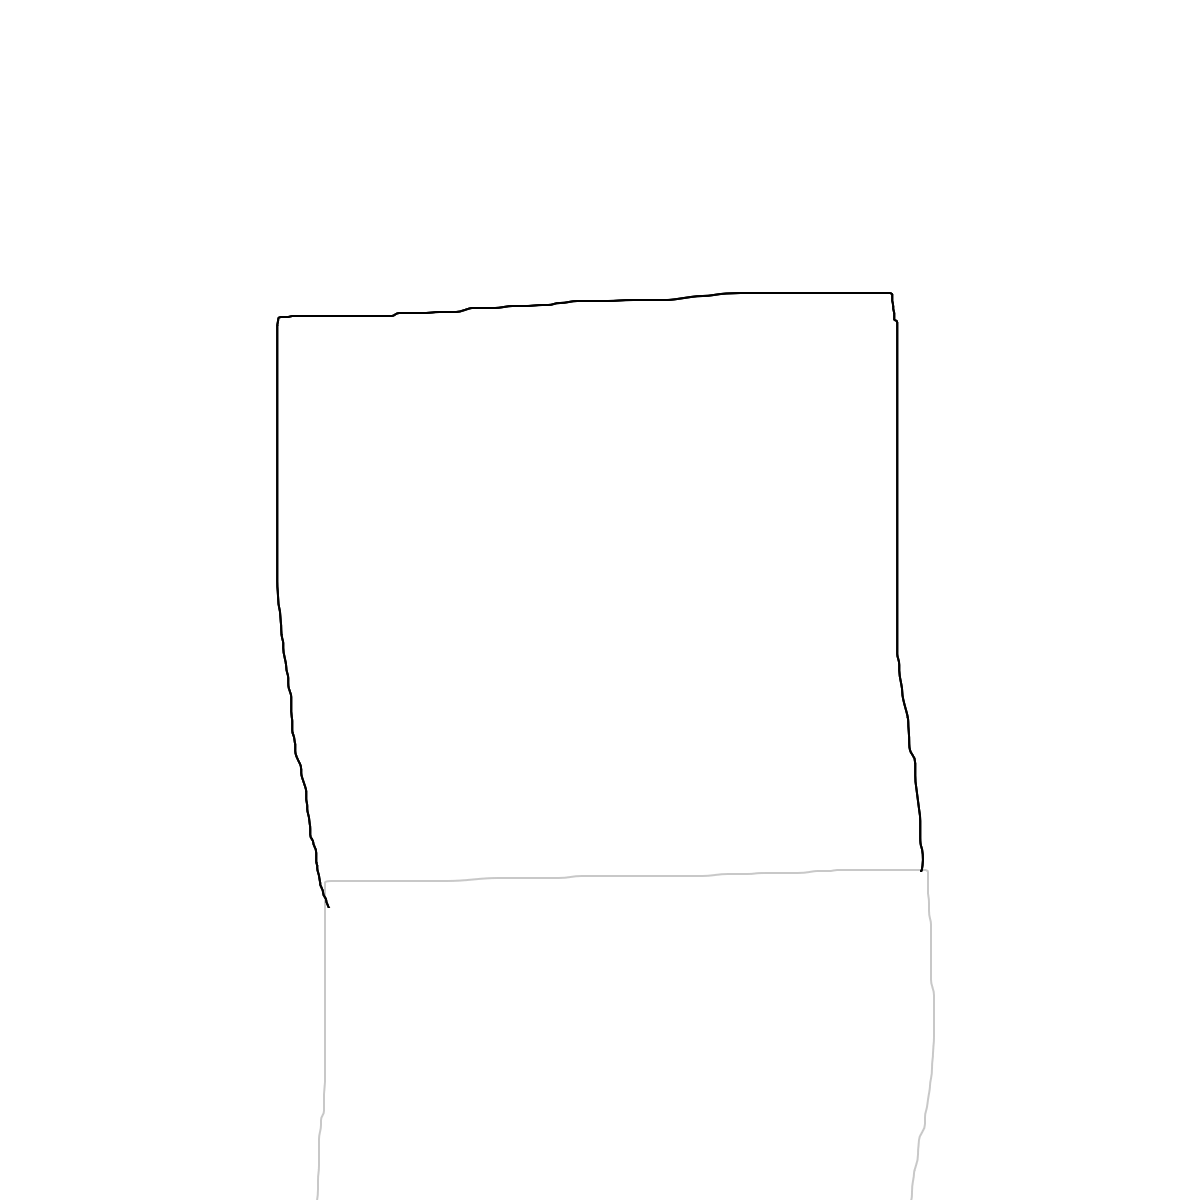 BAAAM drawing#18822 lat:55.7507324218750000lng: 37.6163444519043000